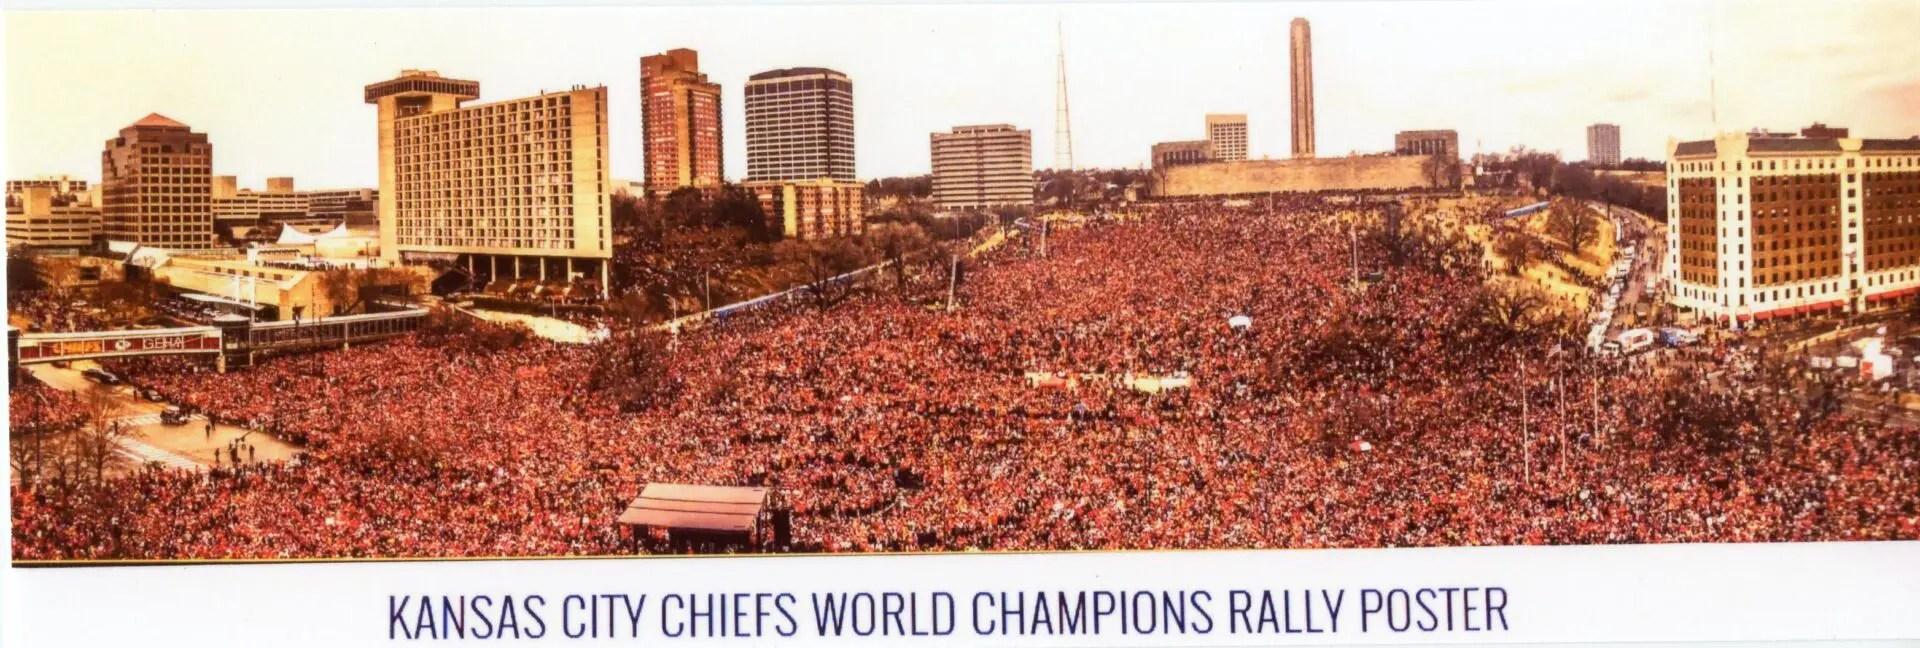 kansas city chiefs world champions rally poster framed